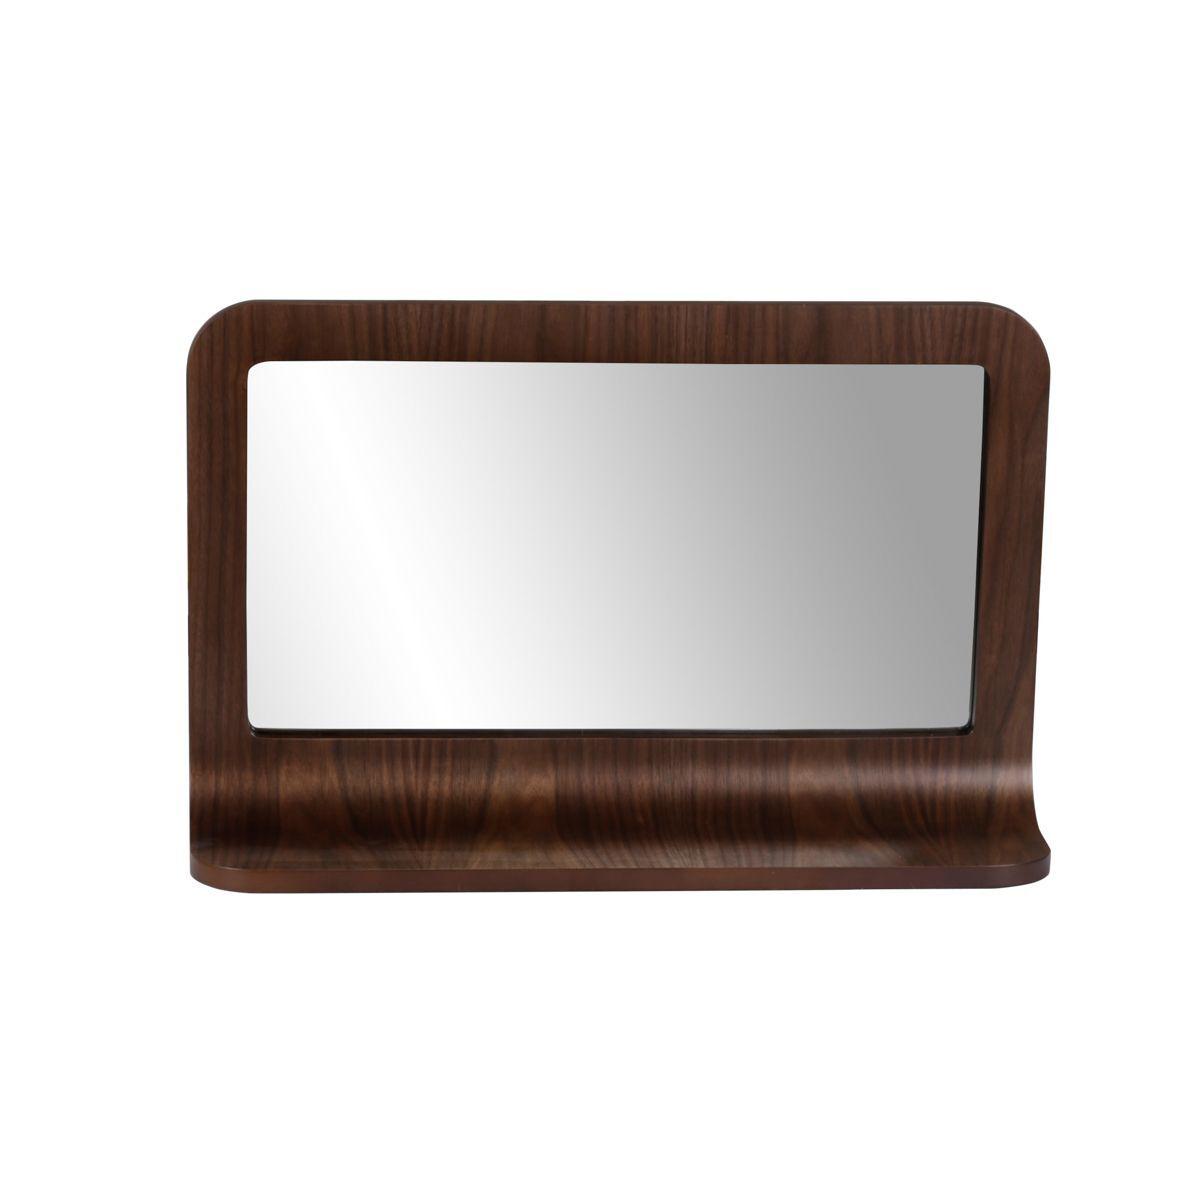 Zago 'Miroir plaqué noyer 72 x 45 cm avec tablette Chill - ZAGO'